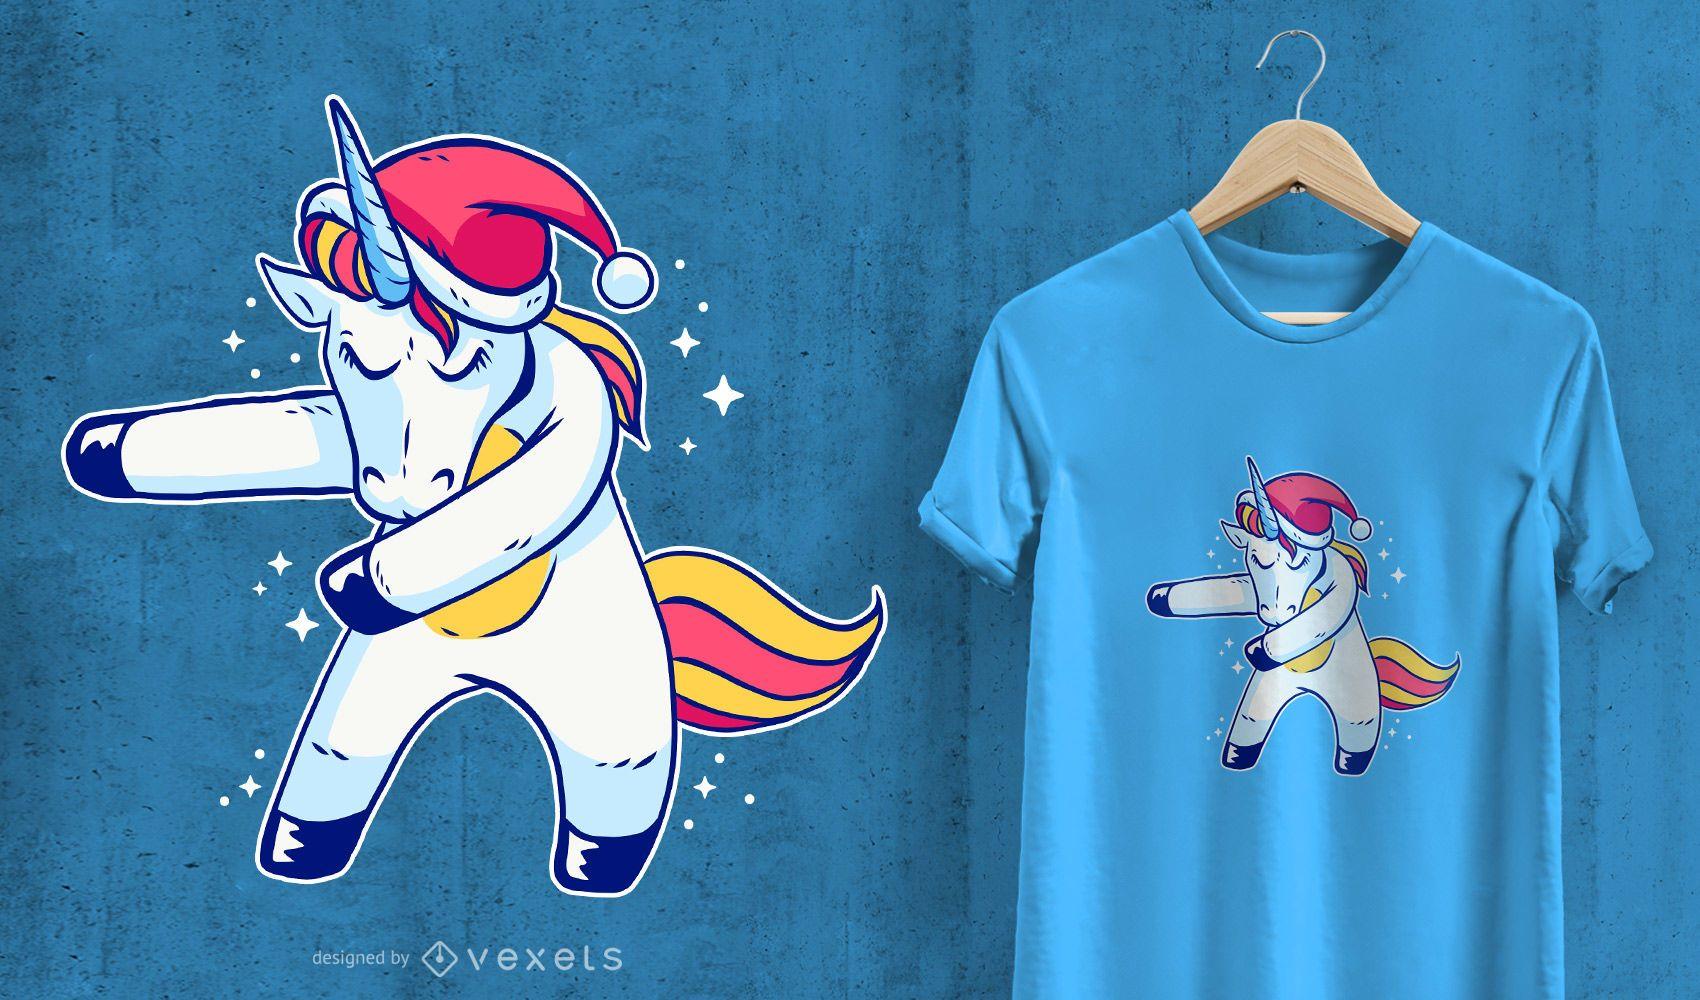 Diseño de camiseta Christmas Unicorn Floss